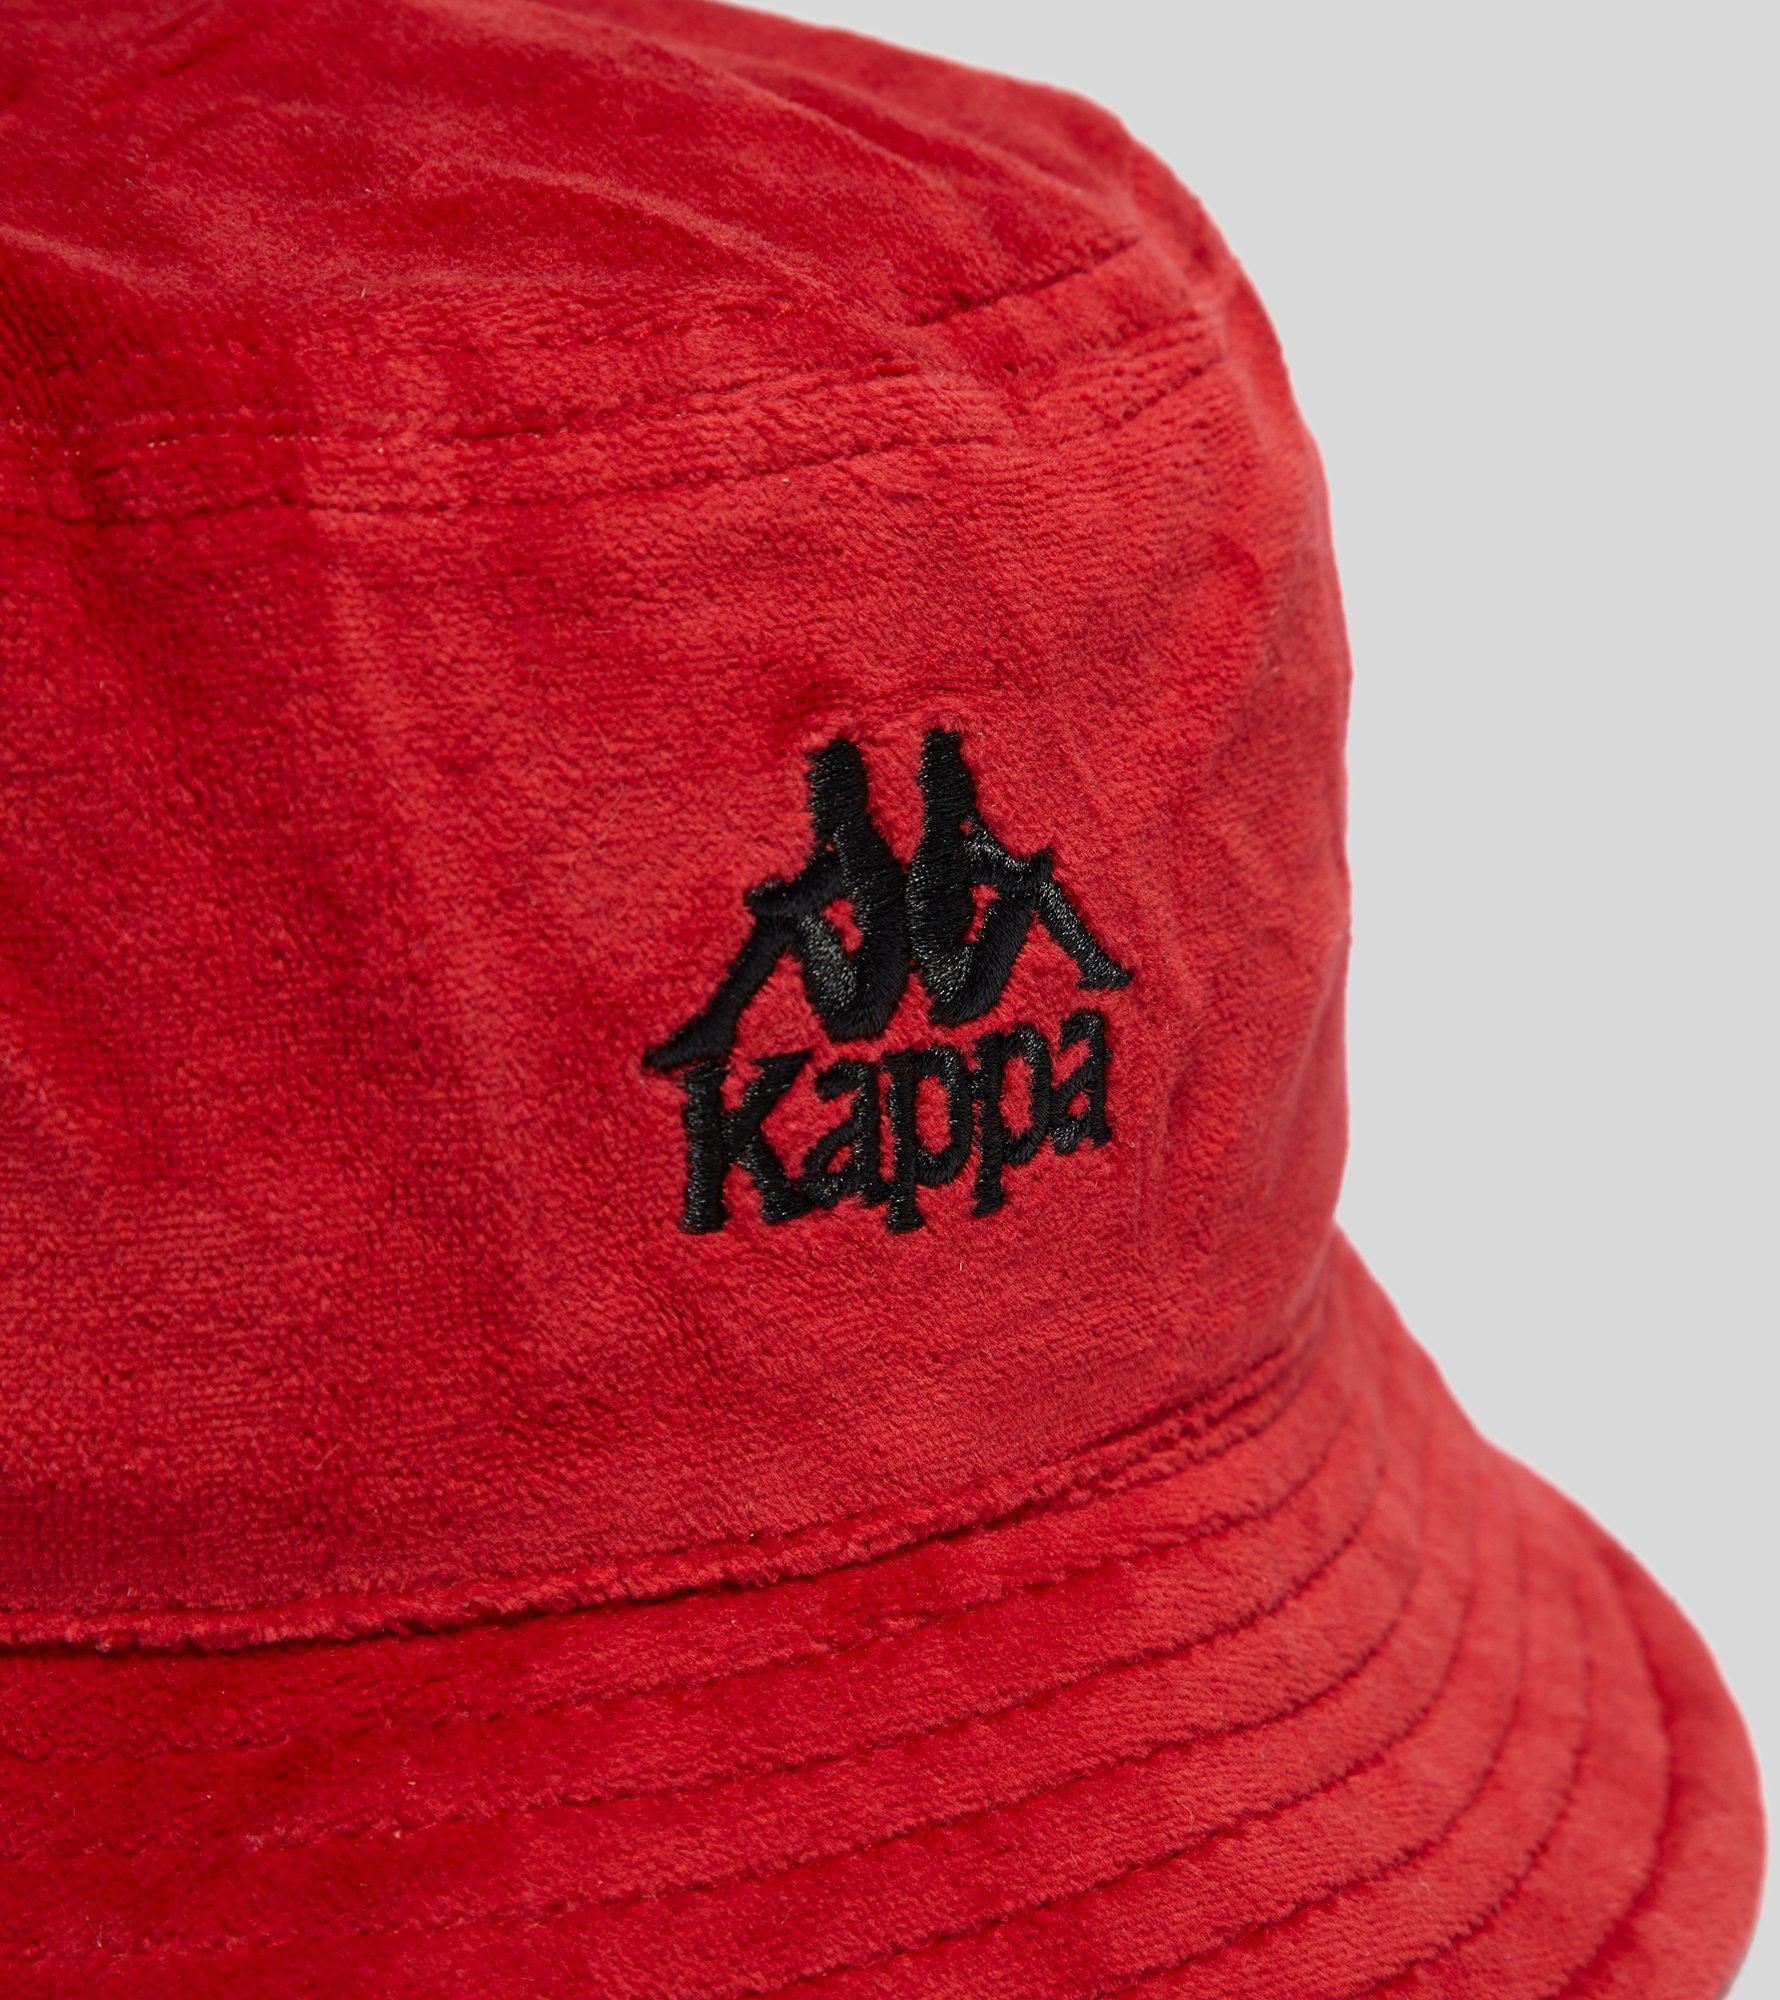 Kappa Ayumen Bucket Hat in Red for Men - Lyst 5851560dabe1